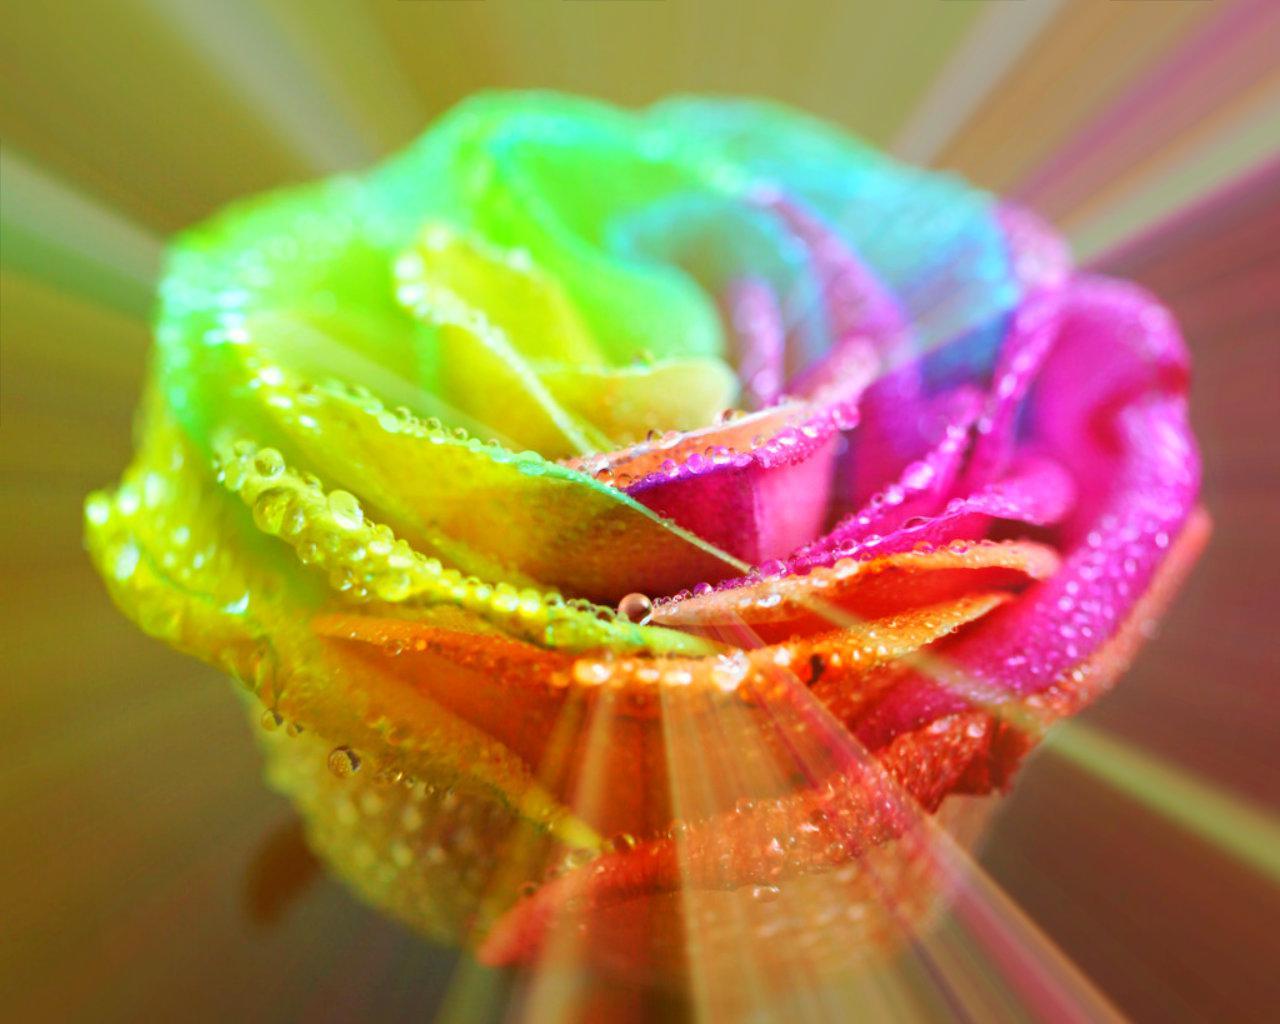 Rainbow roses wallpaper wallpapersafari for What are rainbow roses